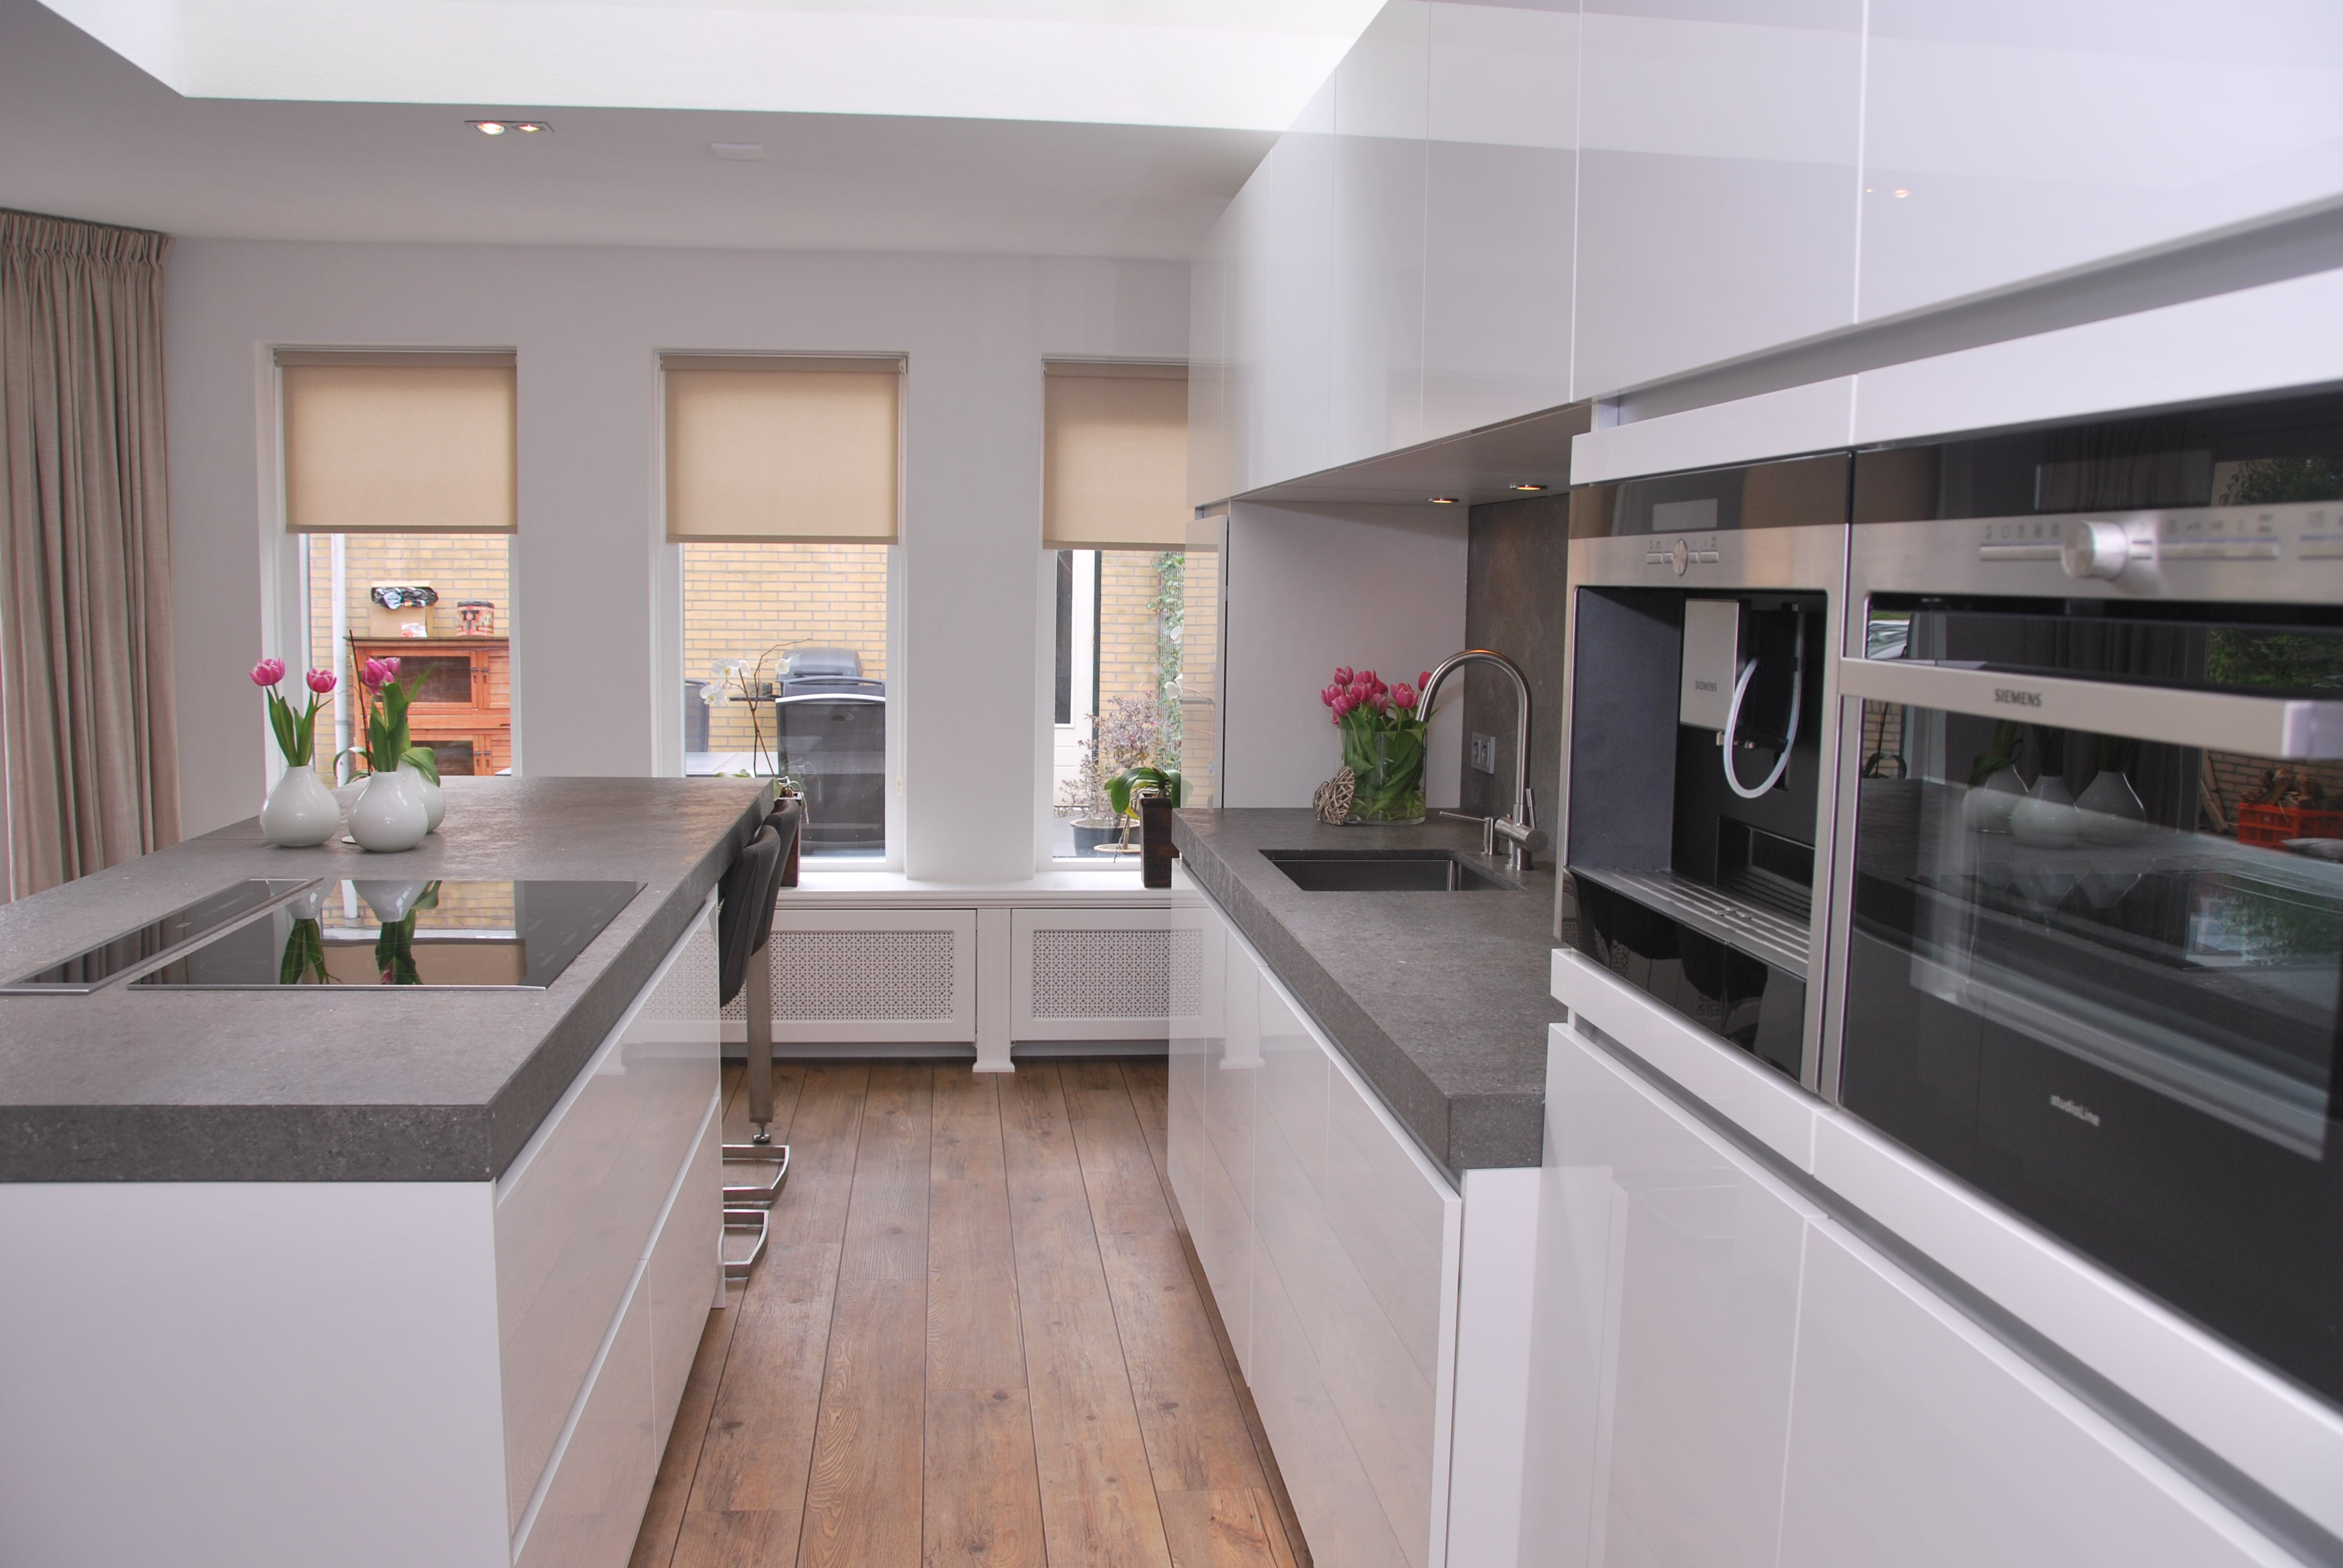 Wit Stoere Keuken : Industriele stijl keuken maison design navsop